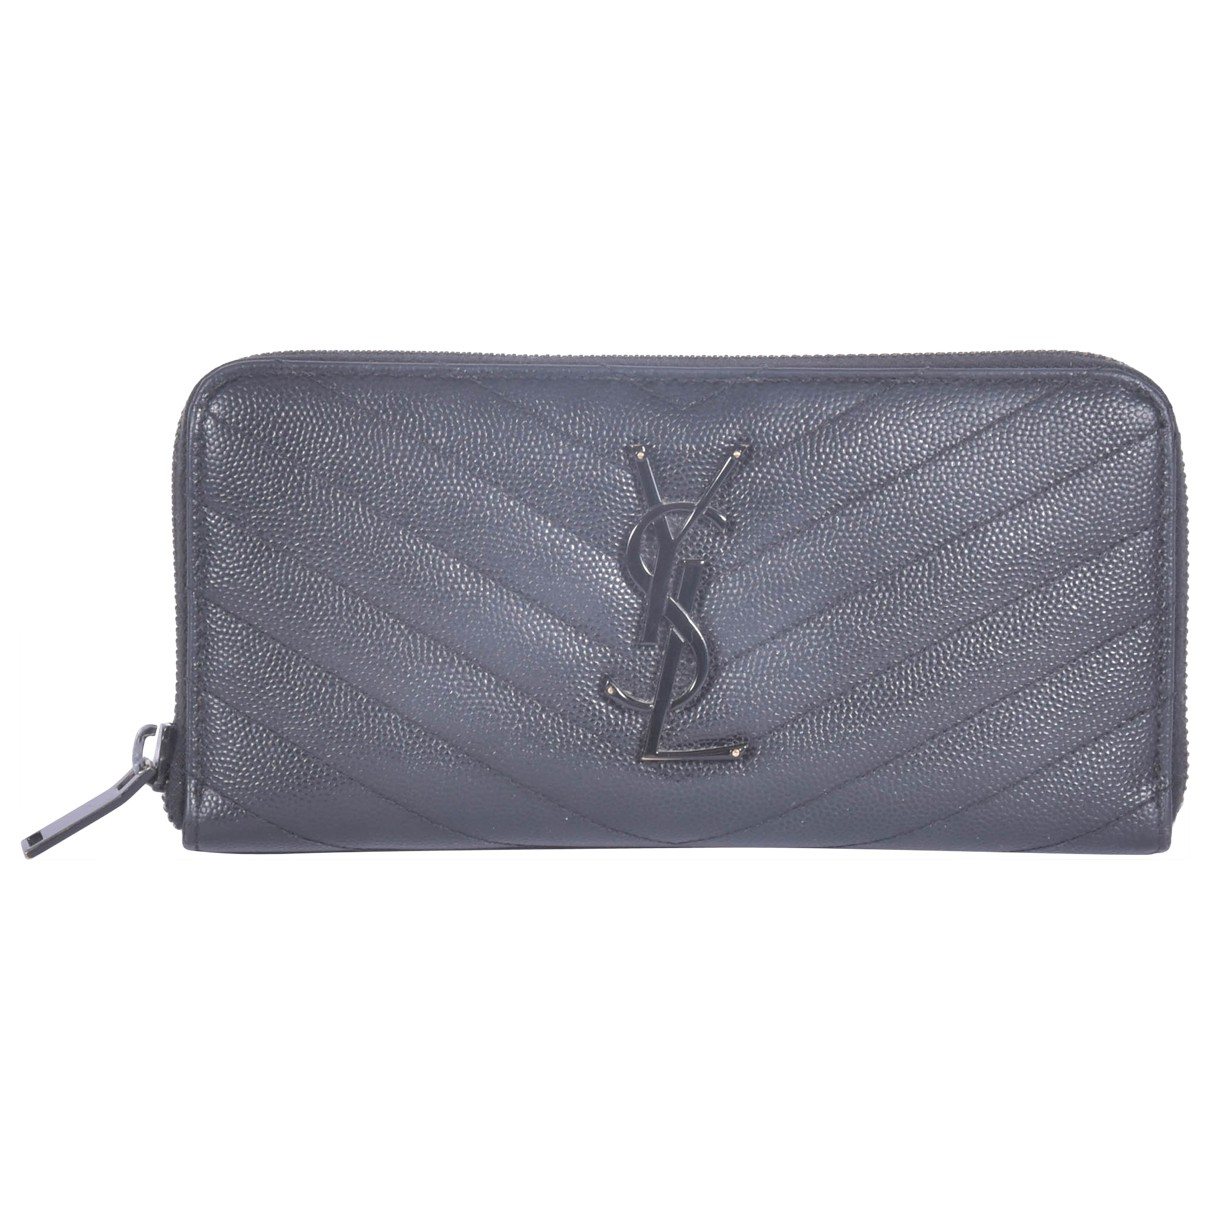 Saint Laurent Monogramme Black Leather wallet for Women \N